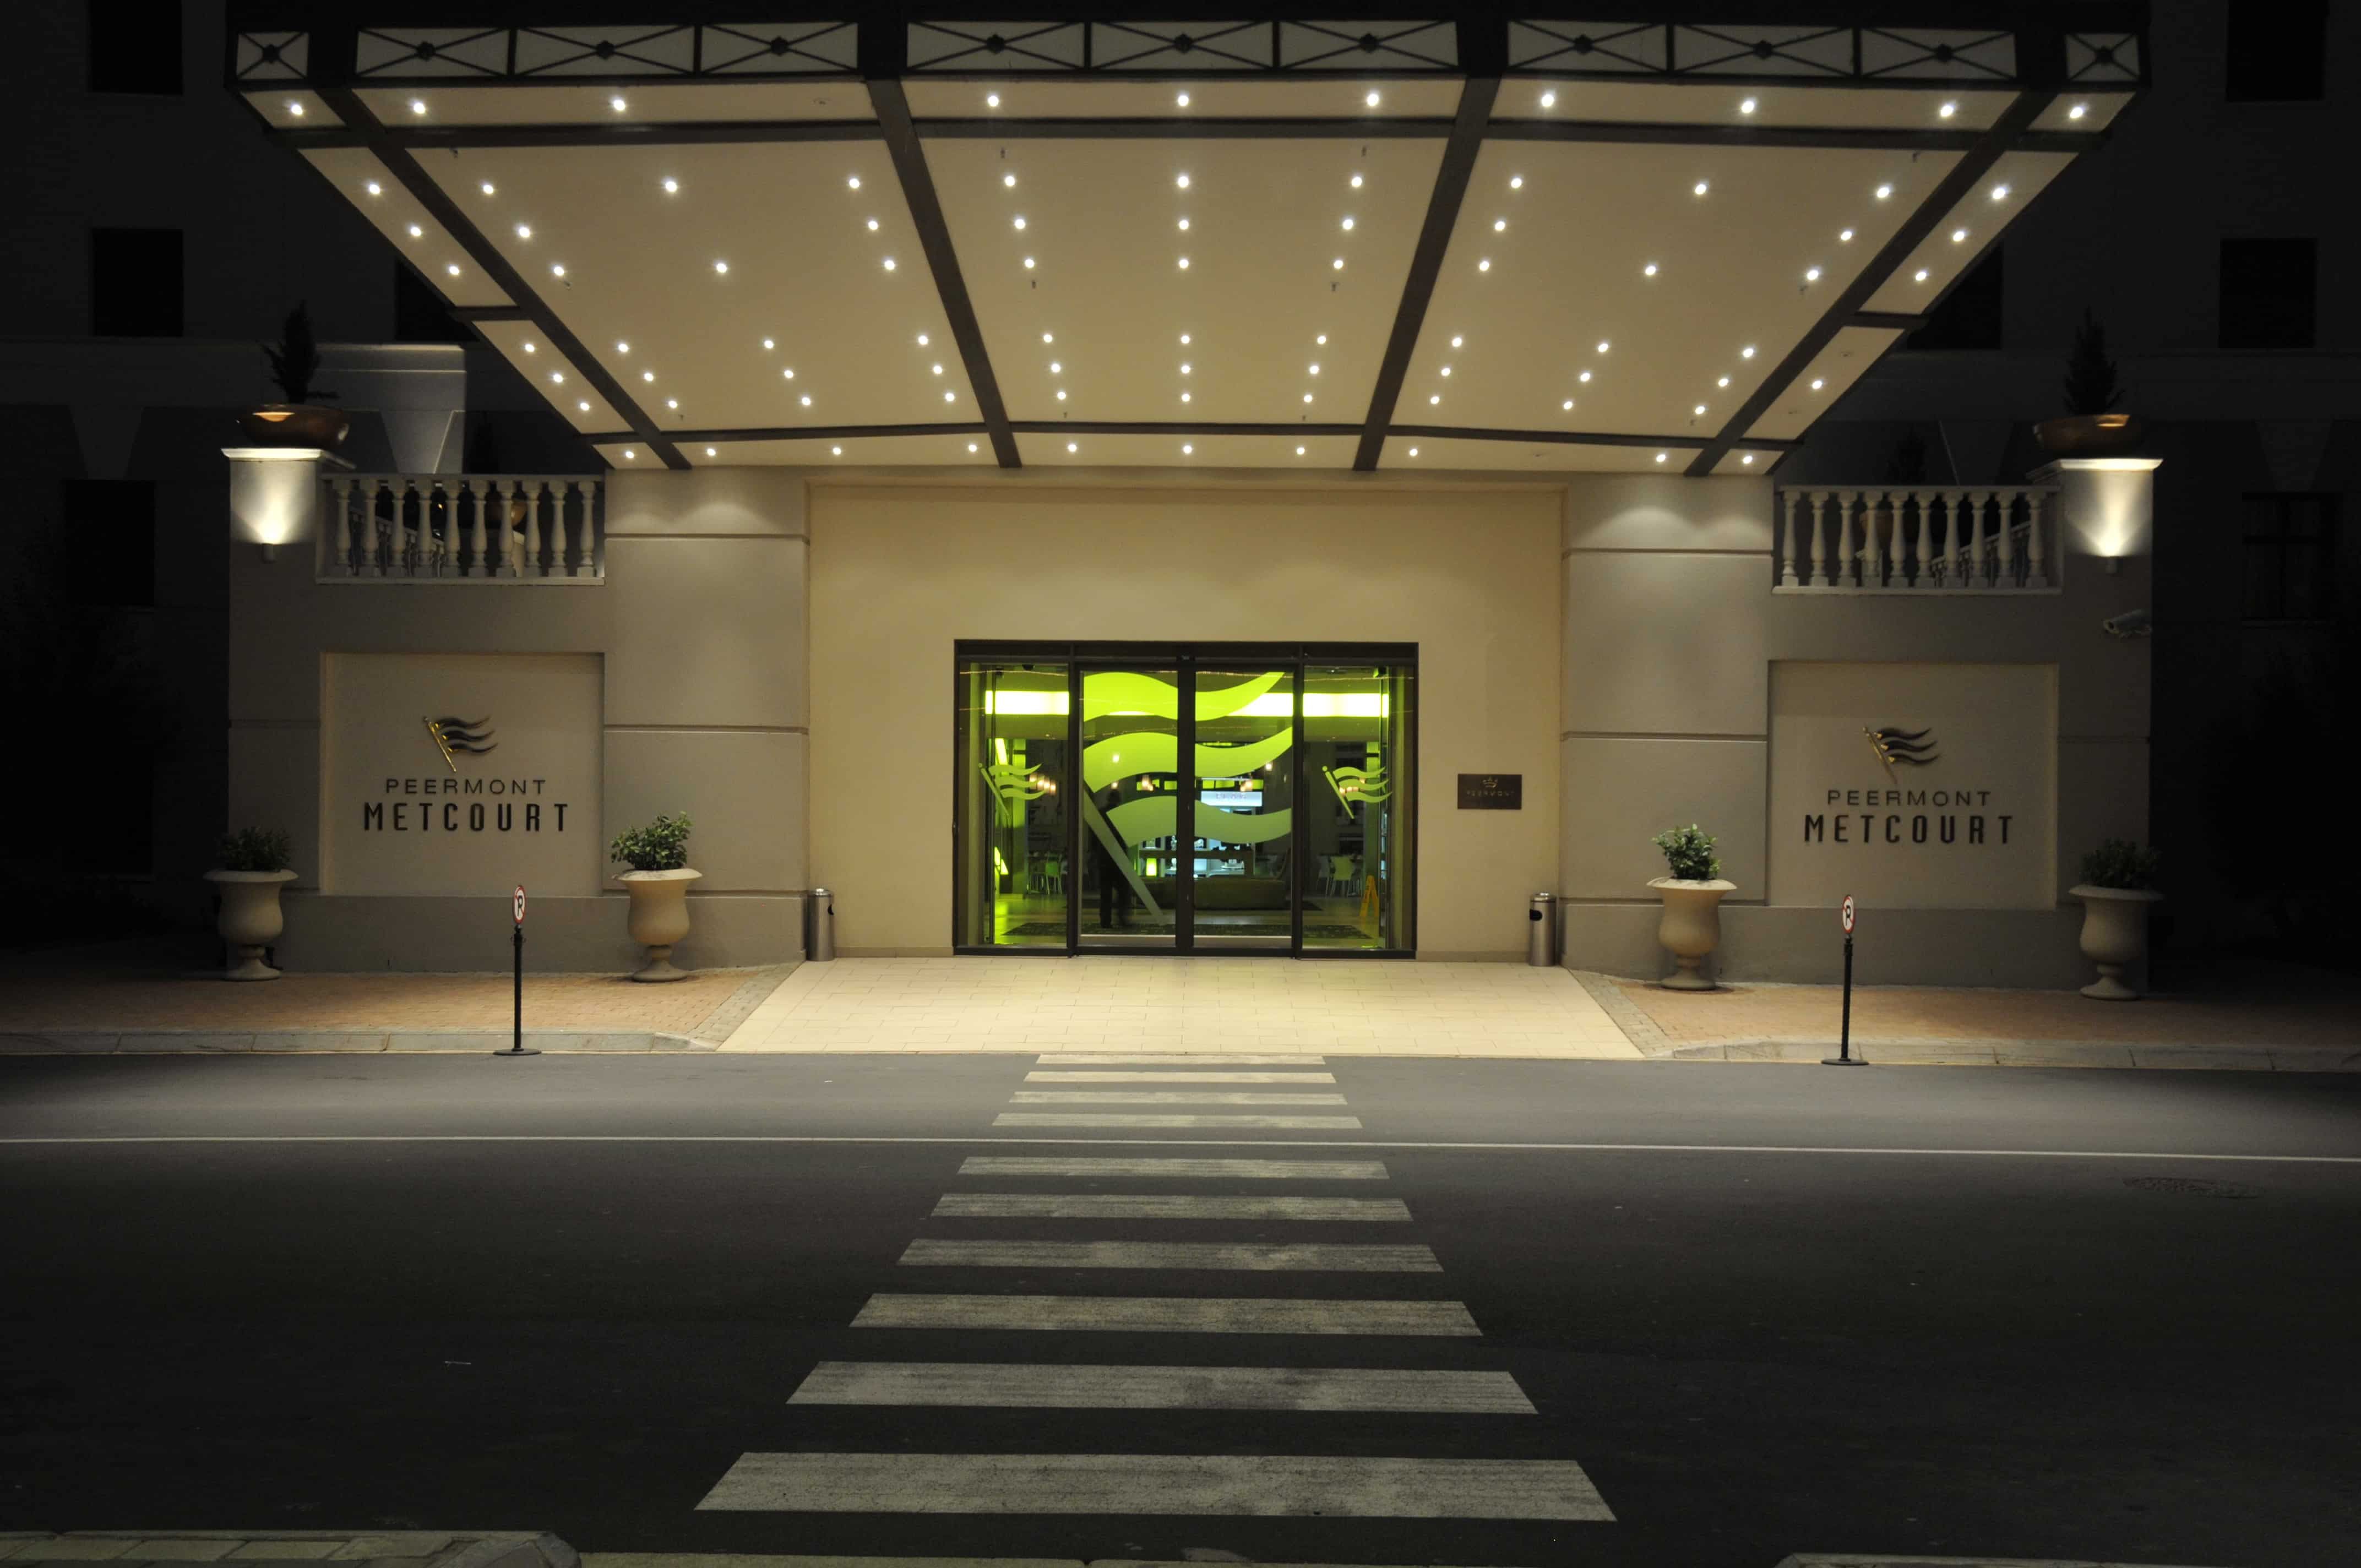 Peermont Metcourt Hotel at Emperors Palace